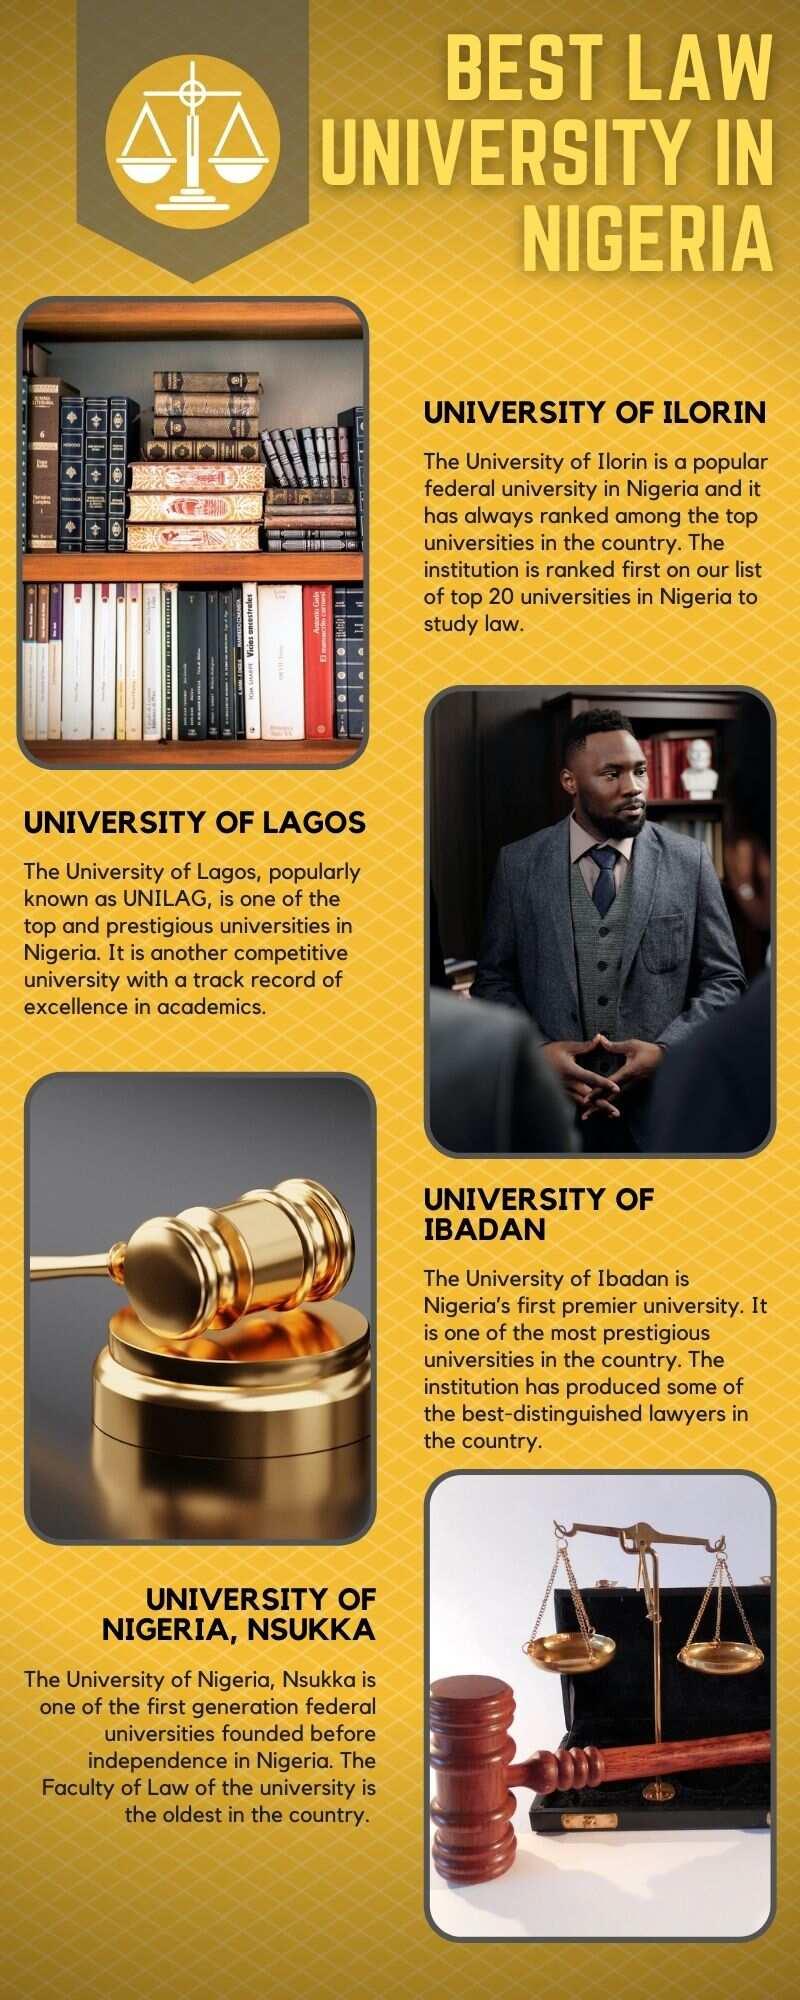 Best Law university in Nigeria